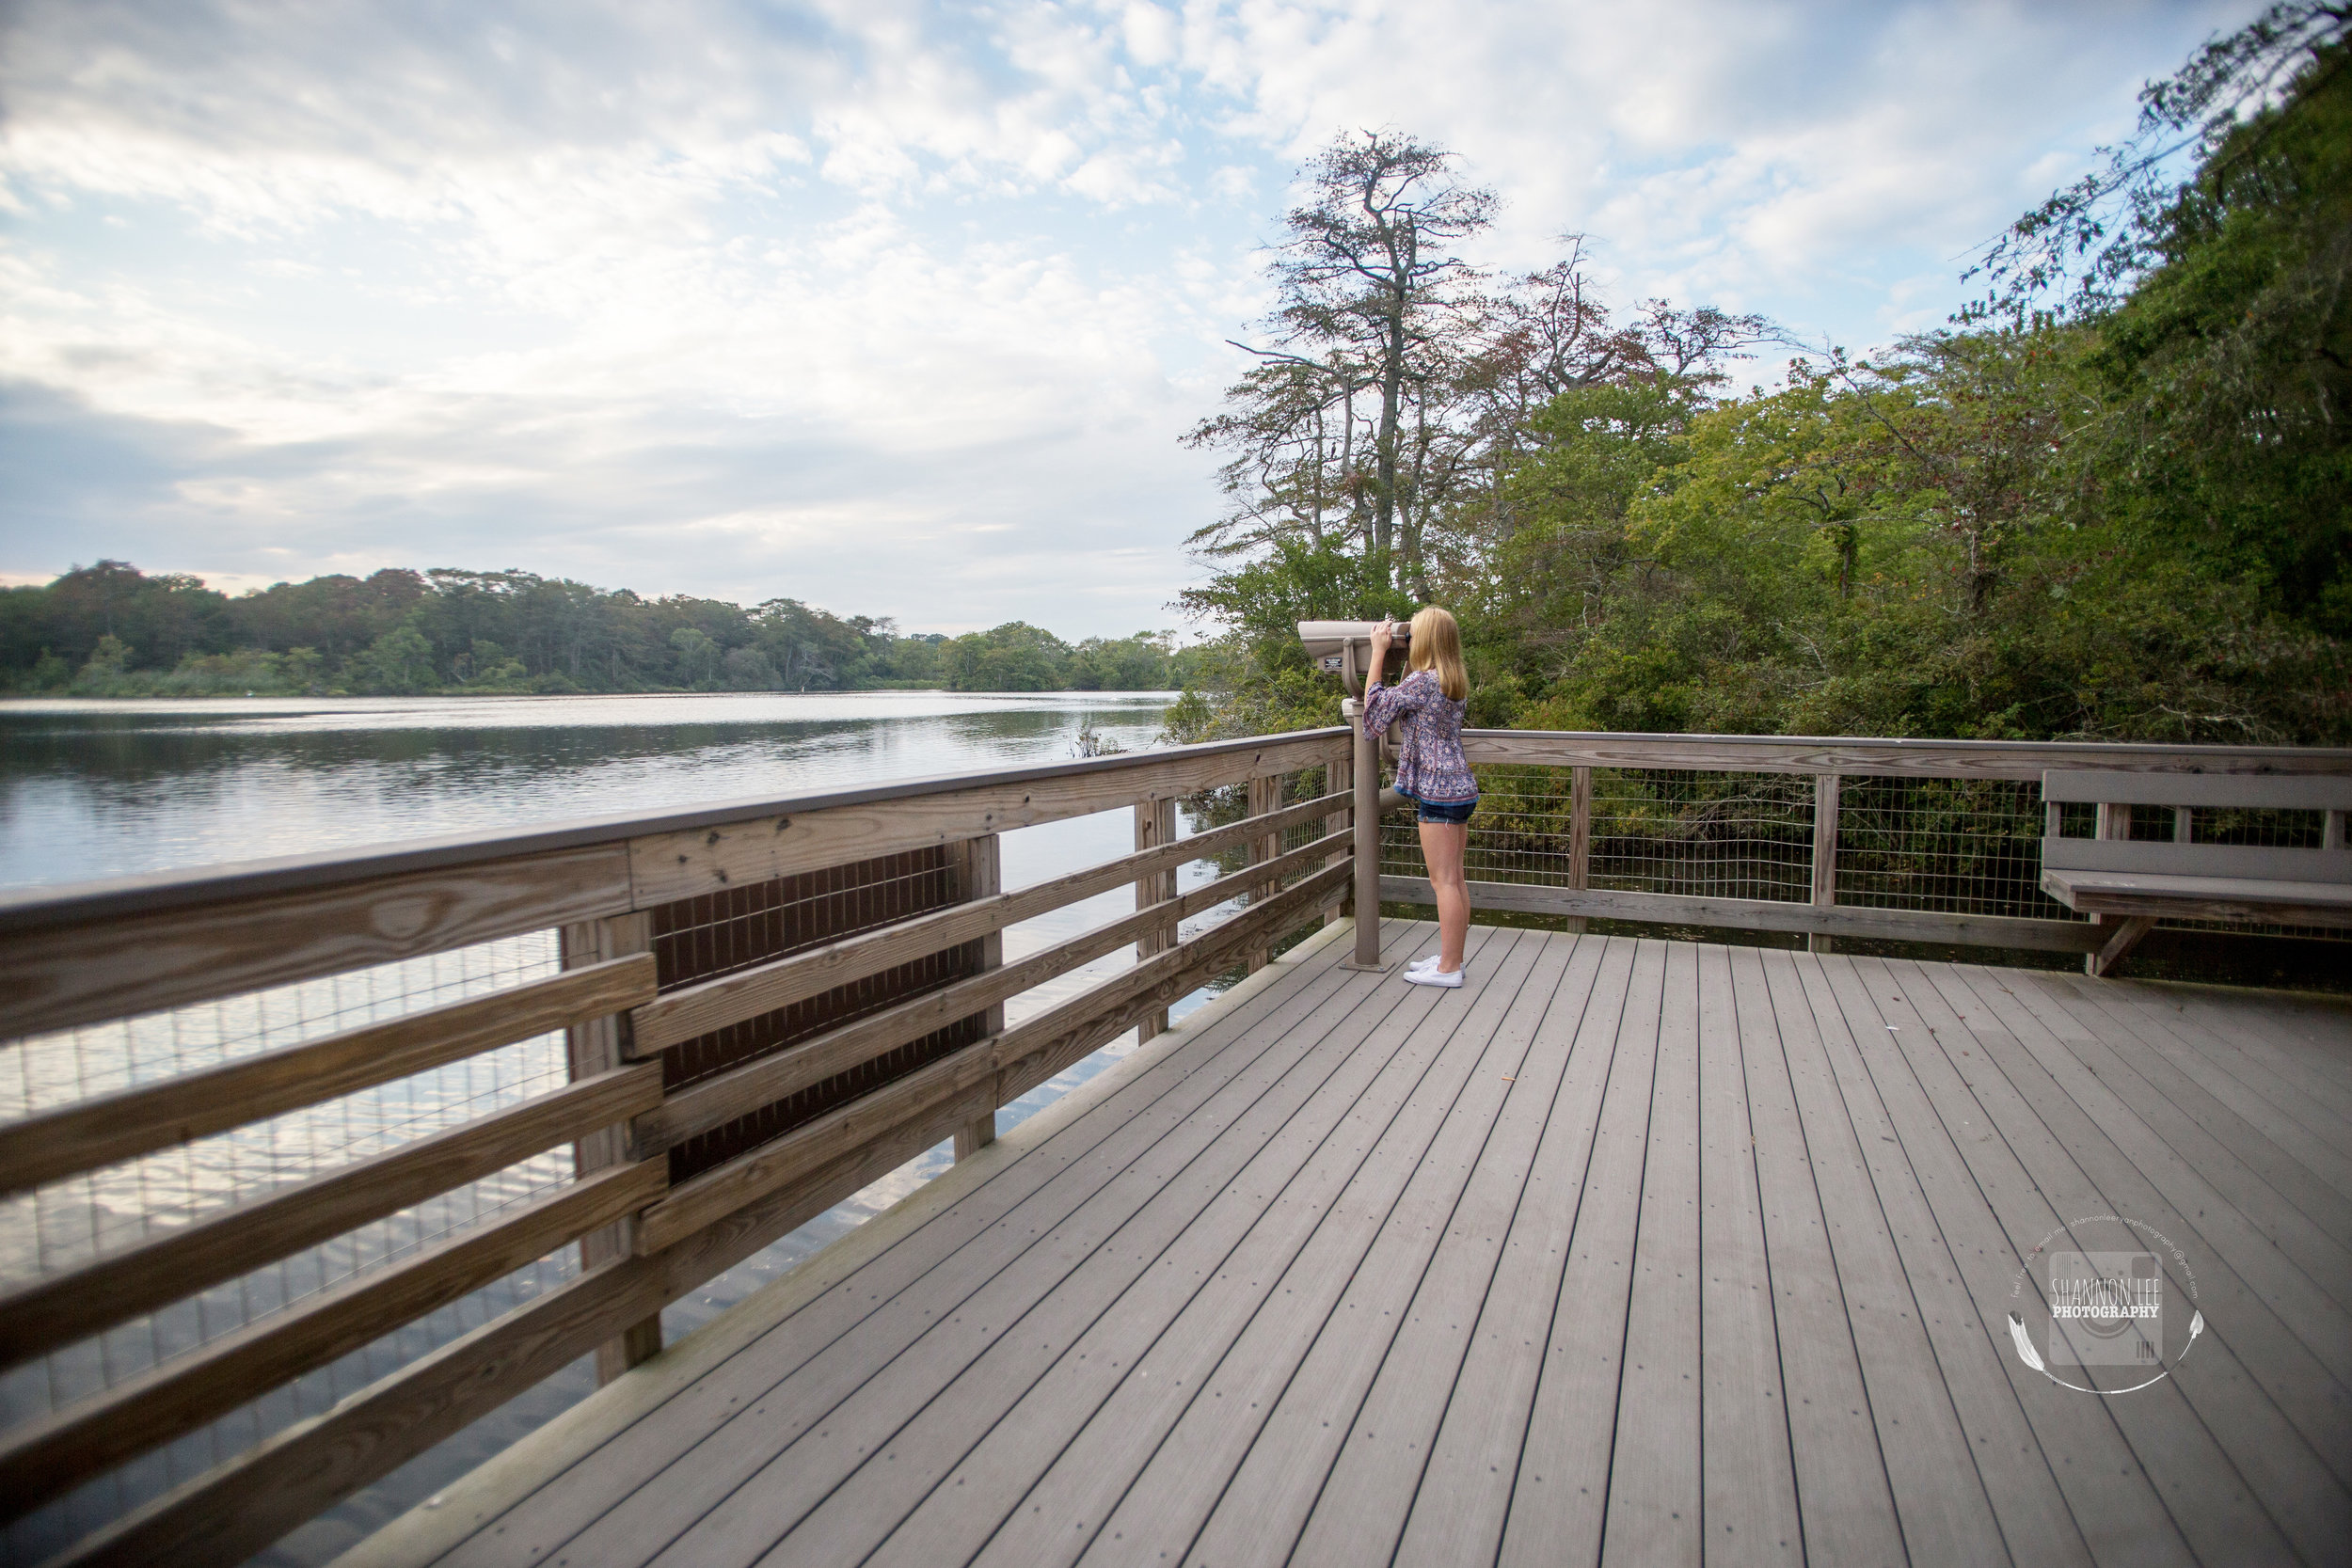 Shannon-lee-photography-Long-Island-New-York-Family-Photographer-7.jpg